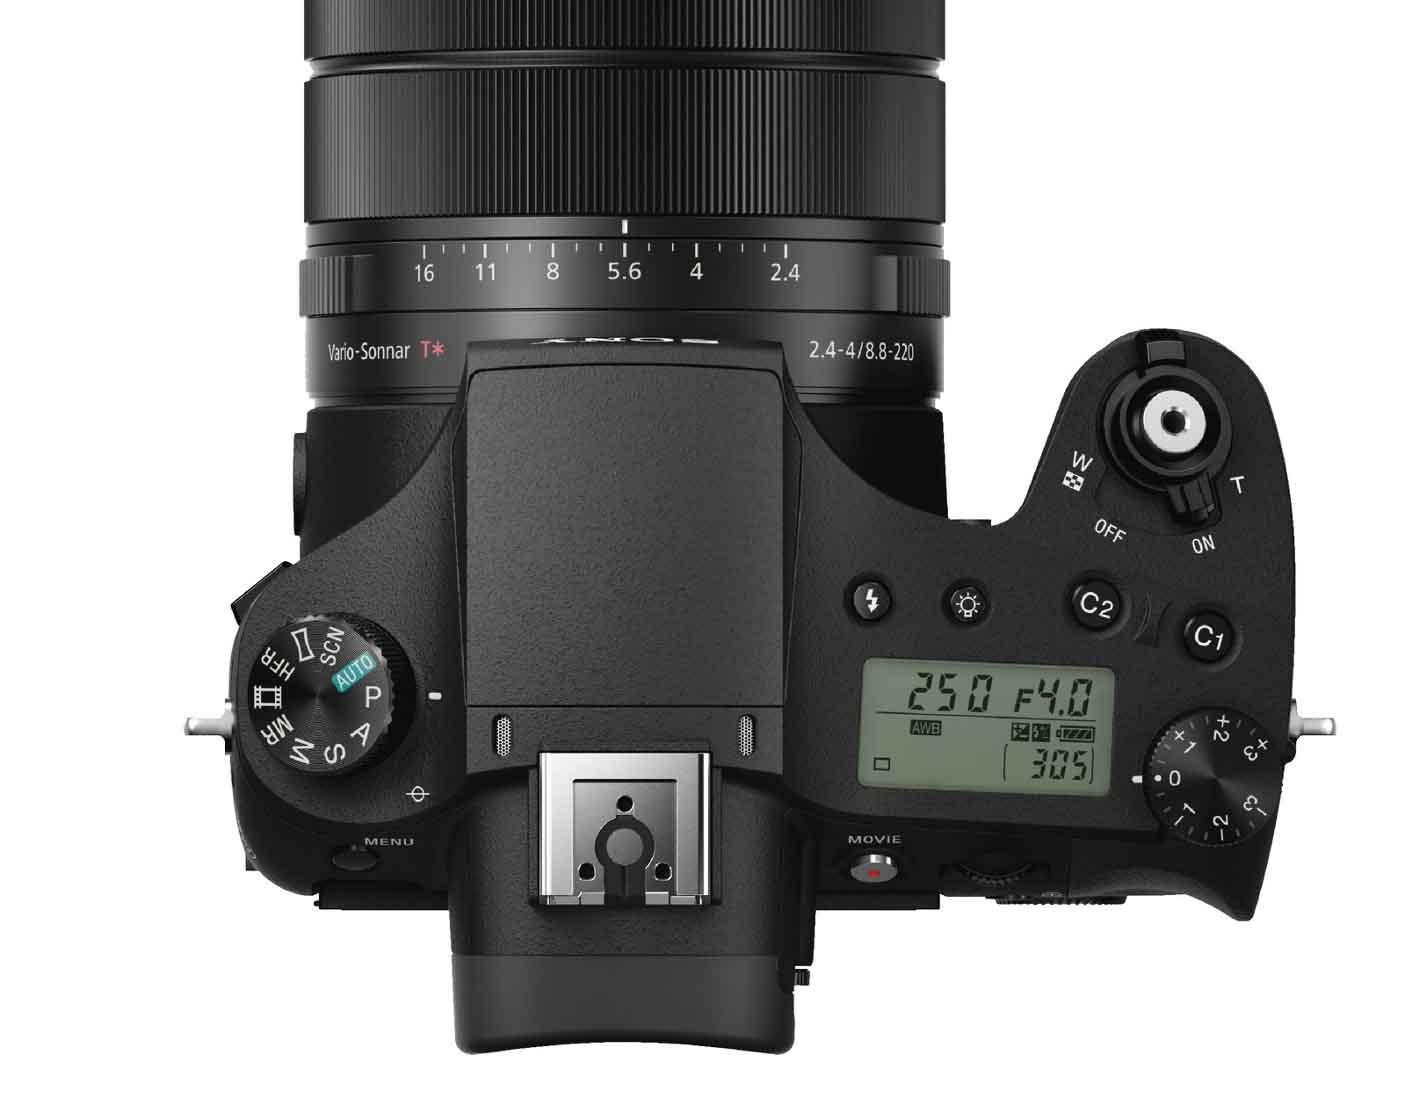 Sony RX10 III Superzoom Camera